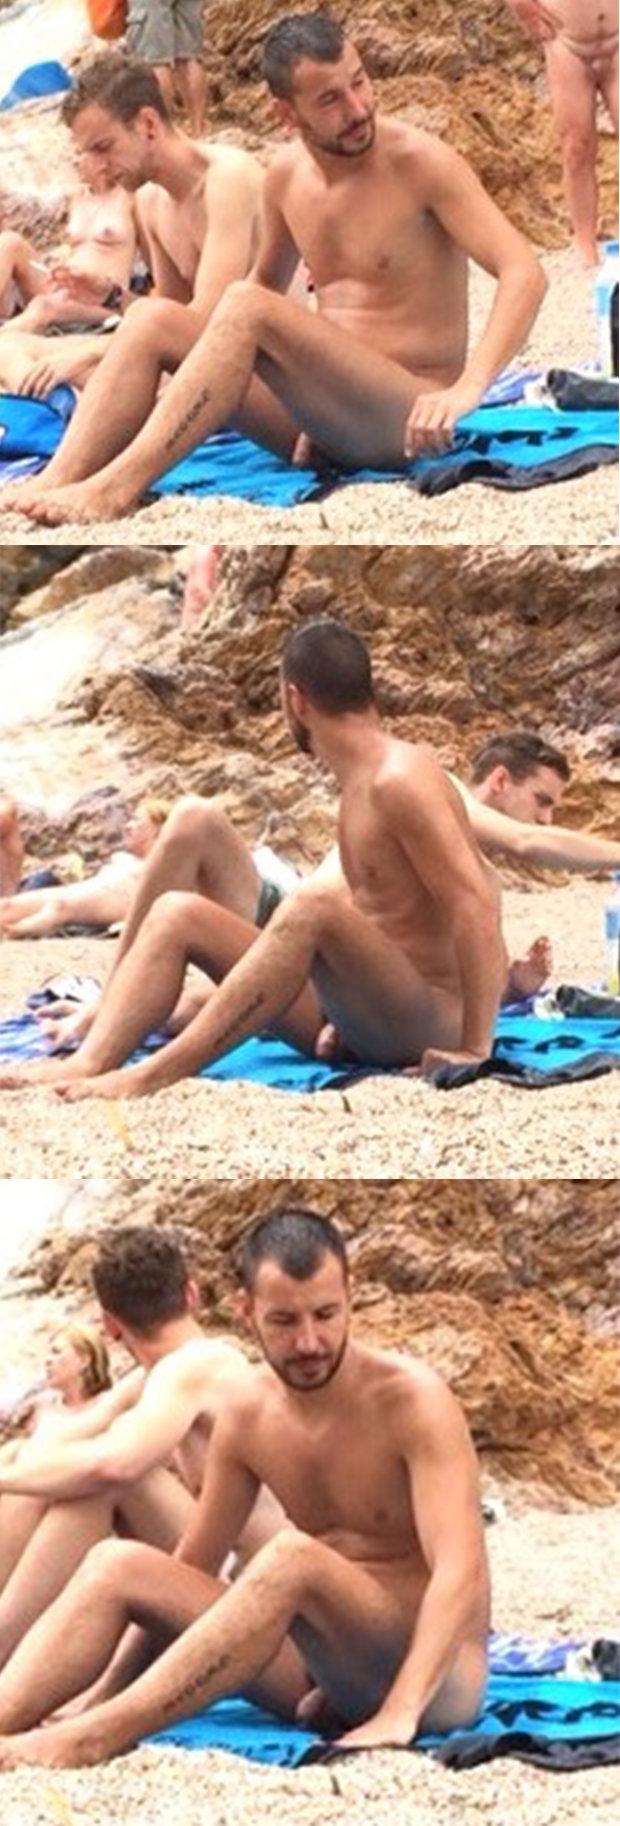 nudist beach guy